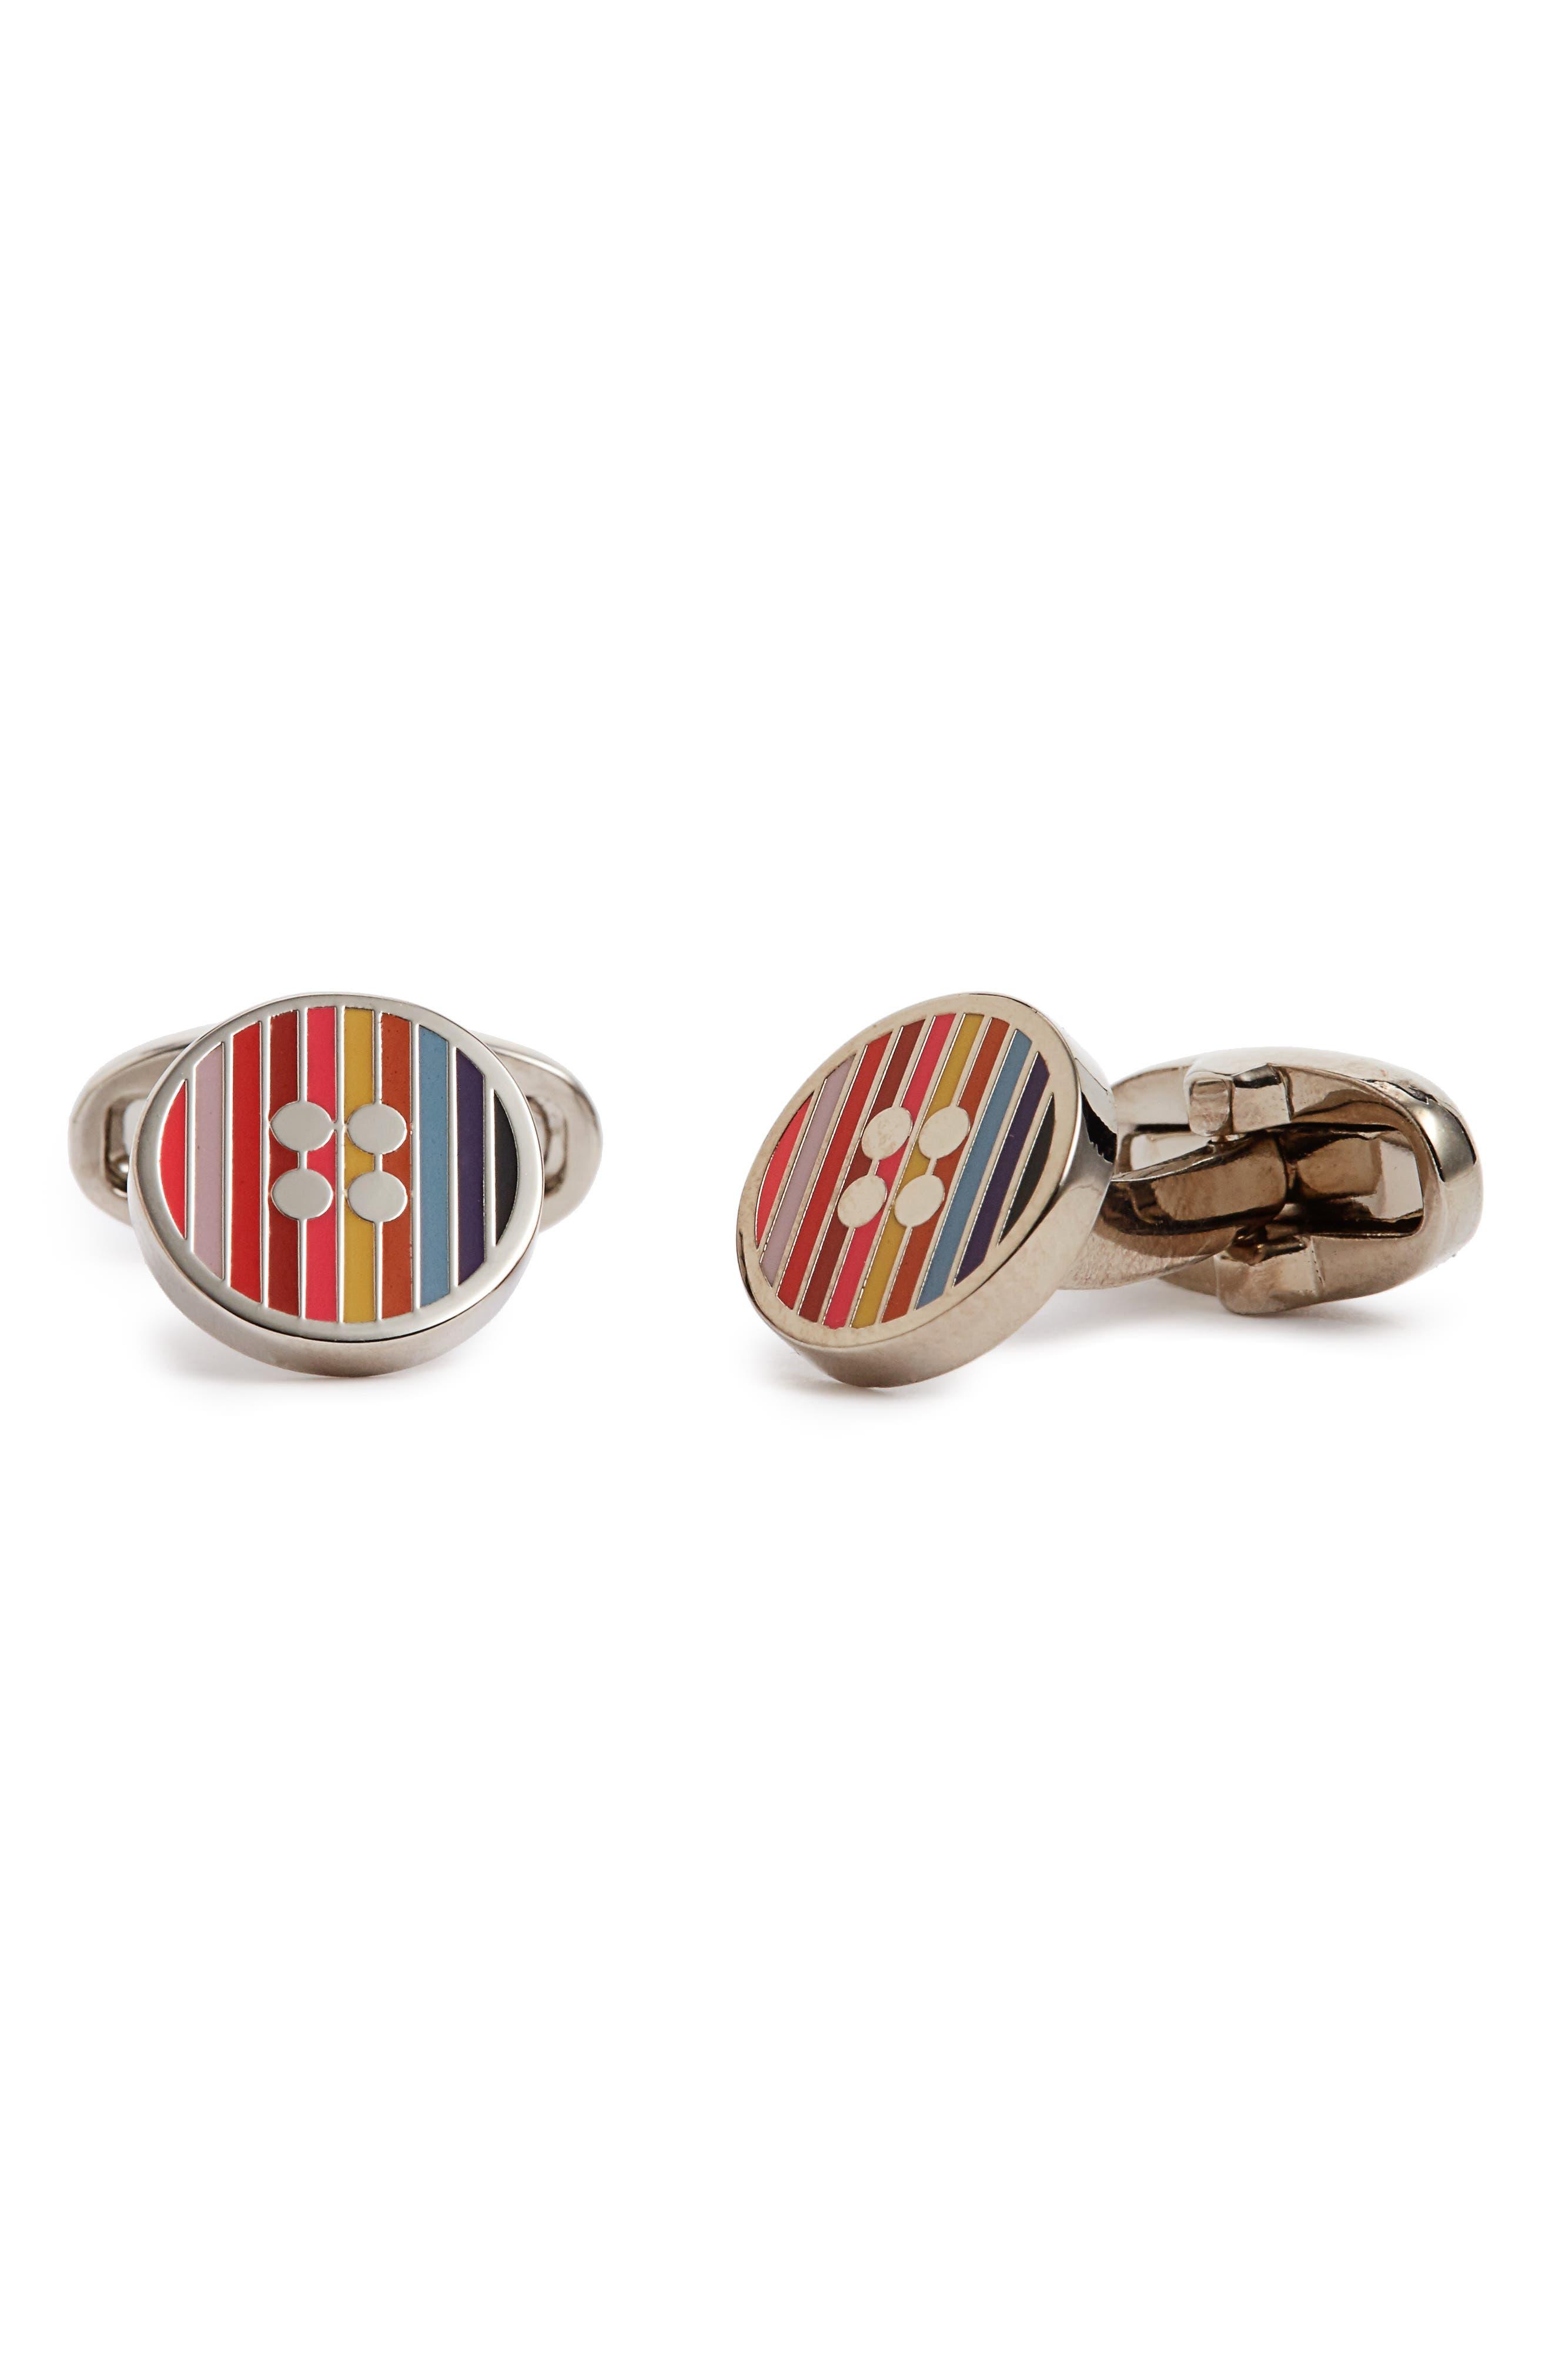 Stripe Button Cuff Links,                             Main thumbnail 1, color,